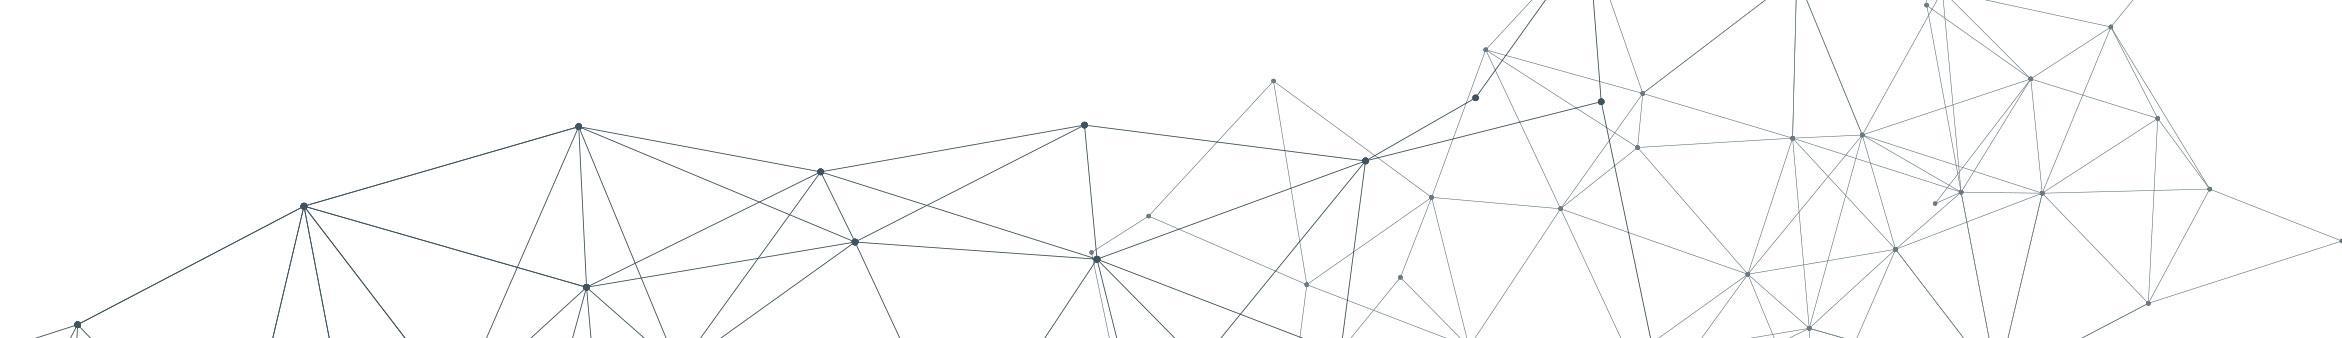 'Pattern grafico